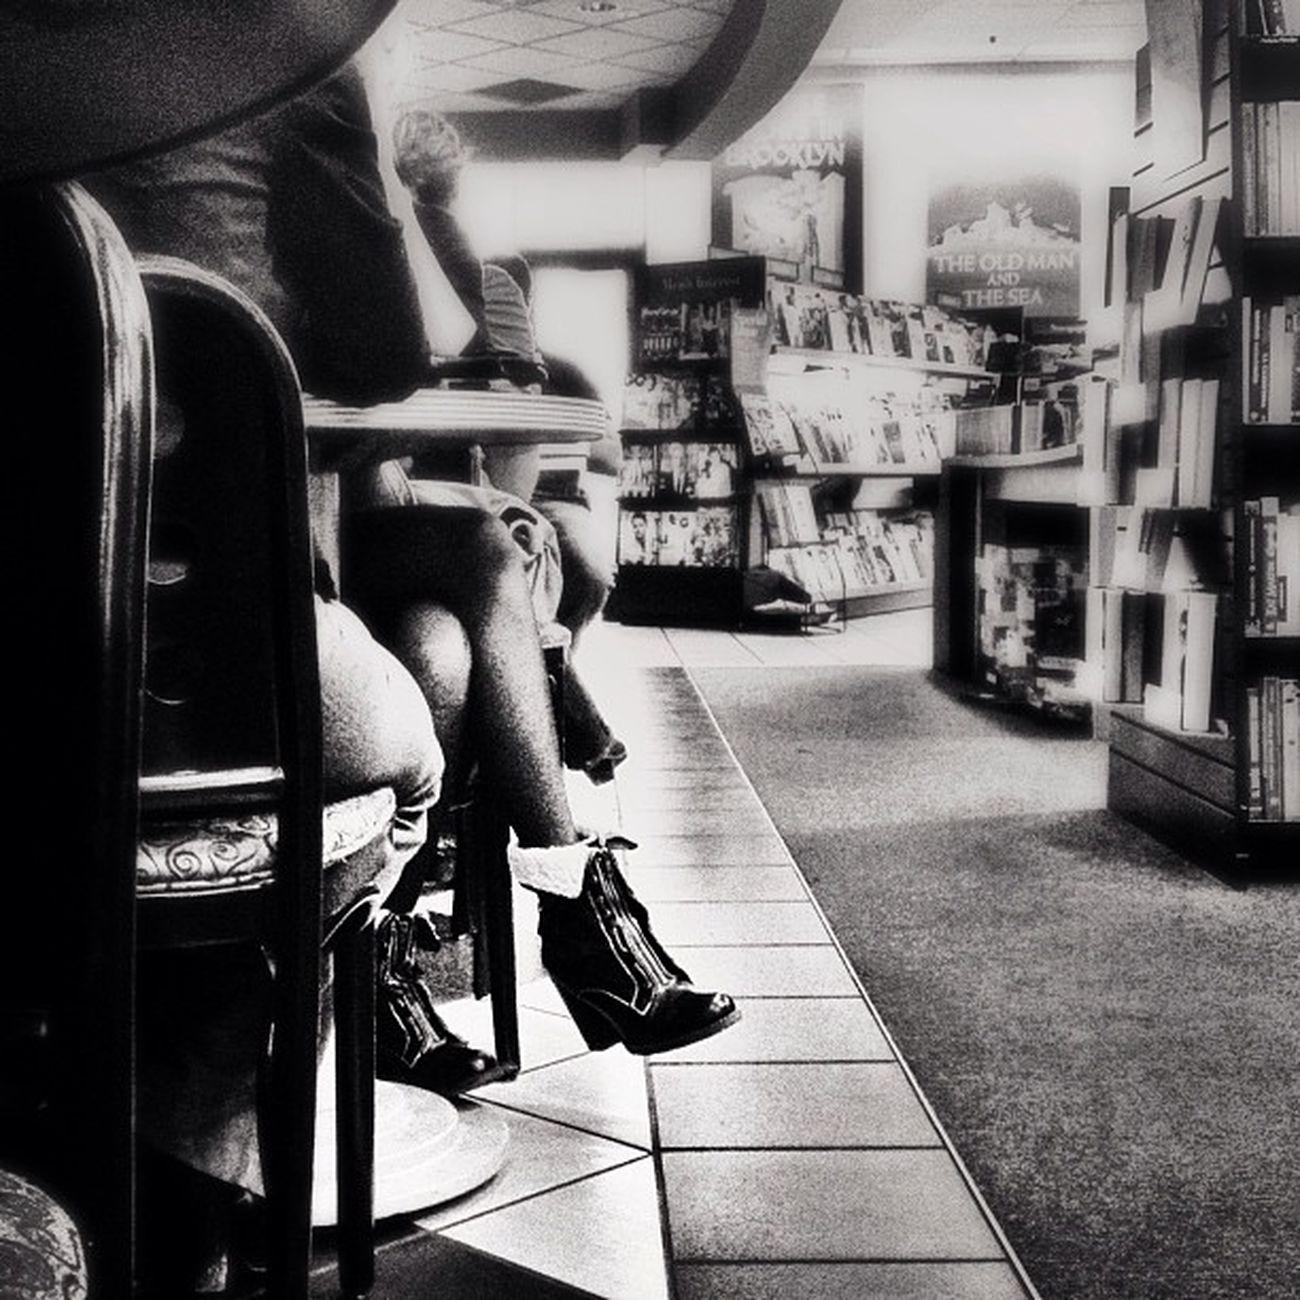 Boot Girls Blackandwhite Legs Boots Bw Bwmasters Mcallen Rgv